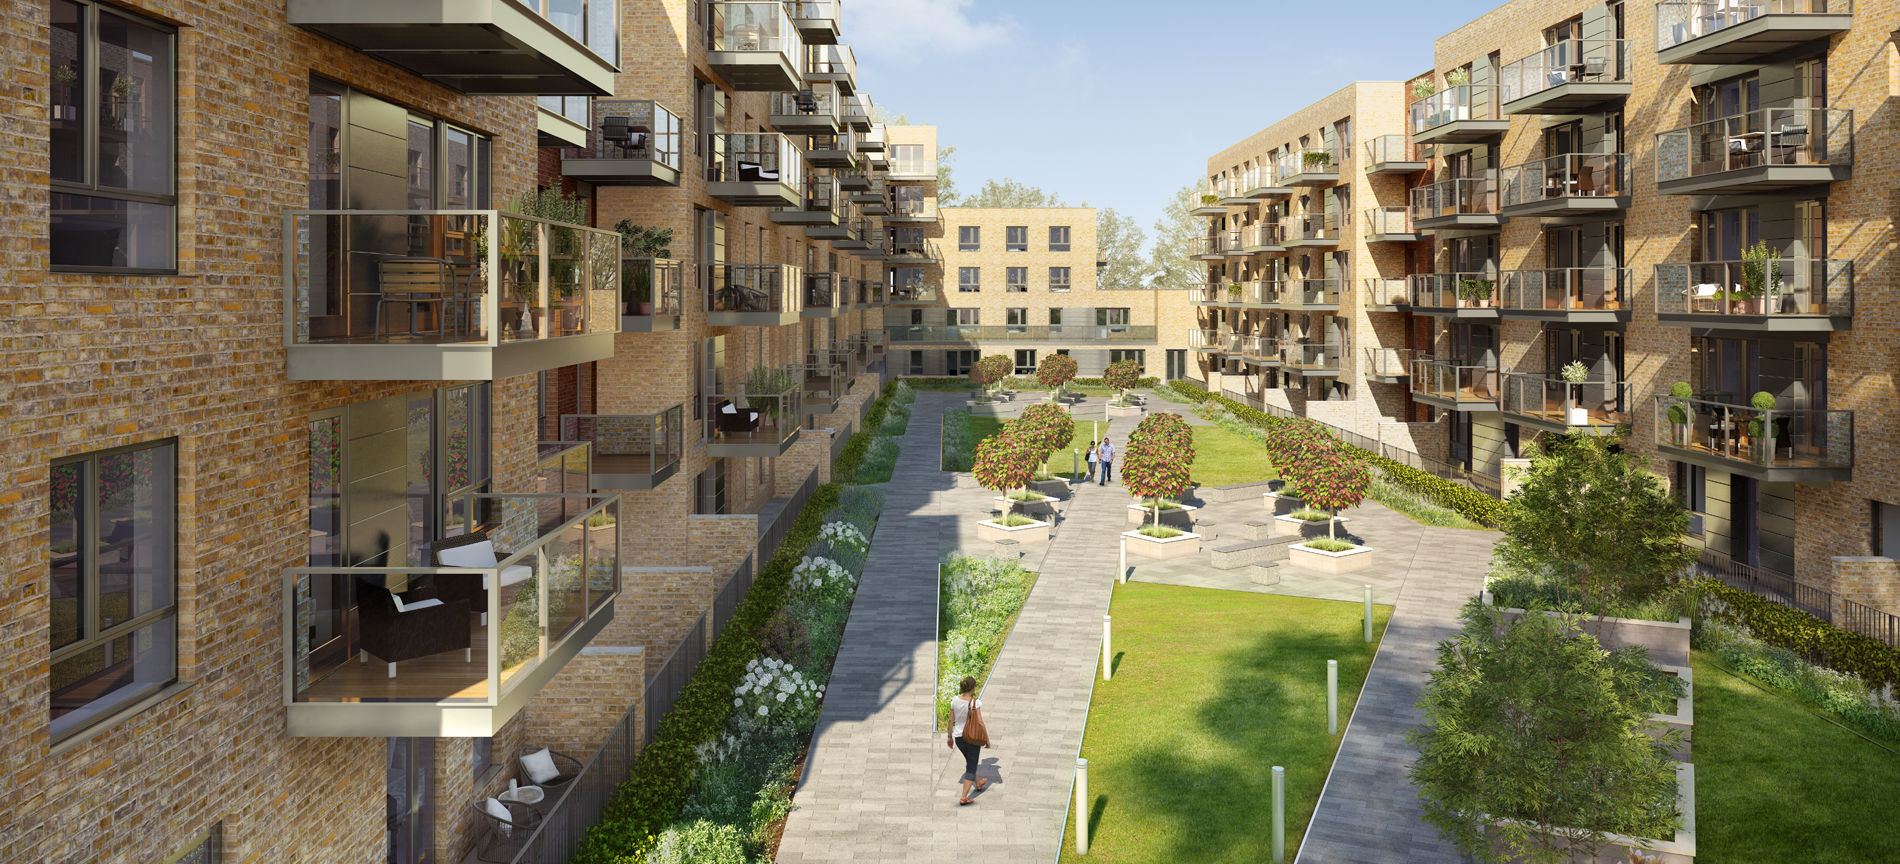 GRID Architects | Hornsey Hornsey